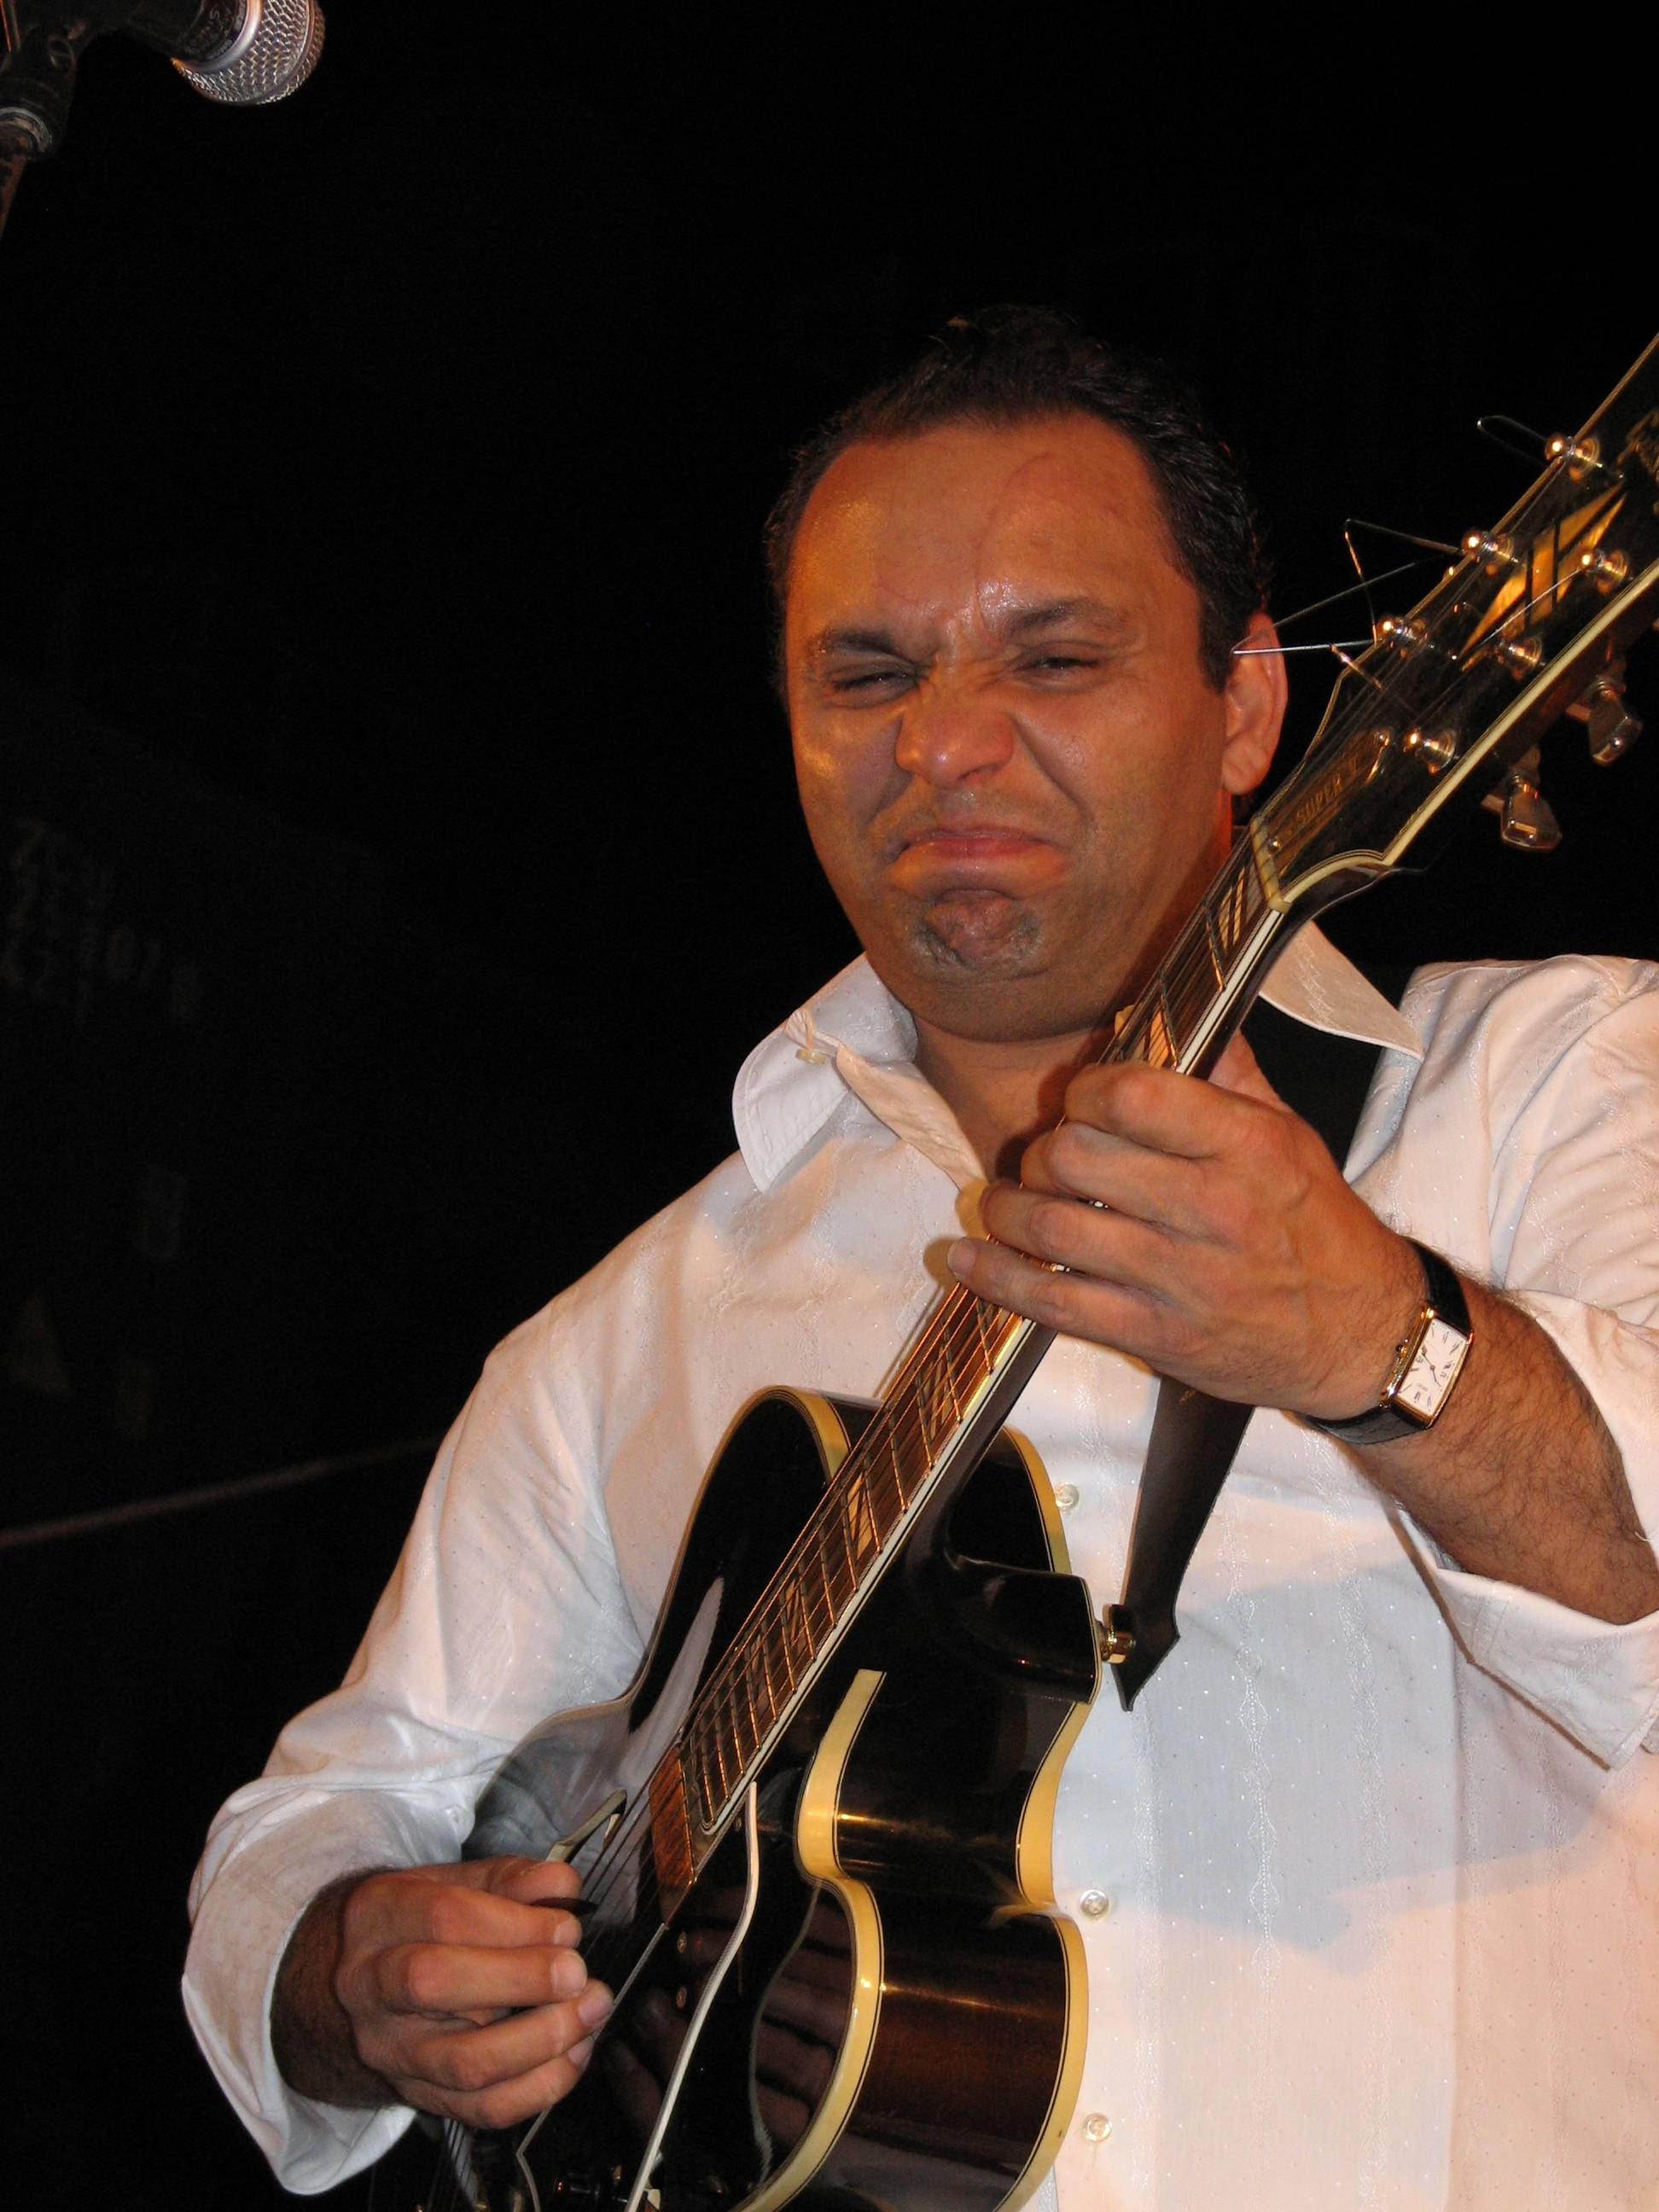 2007-08-29 Bireli Lagrene (Gypsy Project) 3 , Red Sea Jazz Festival, Eilat, Israel